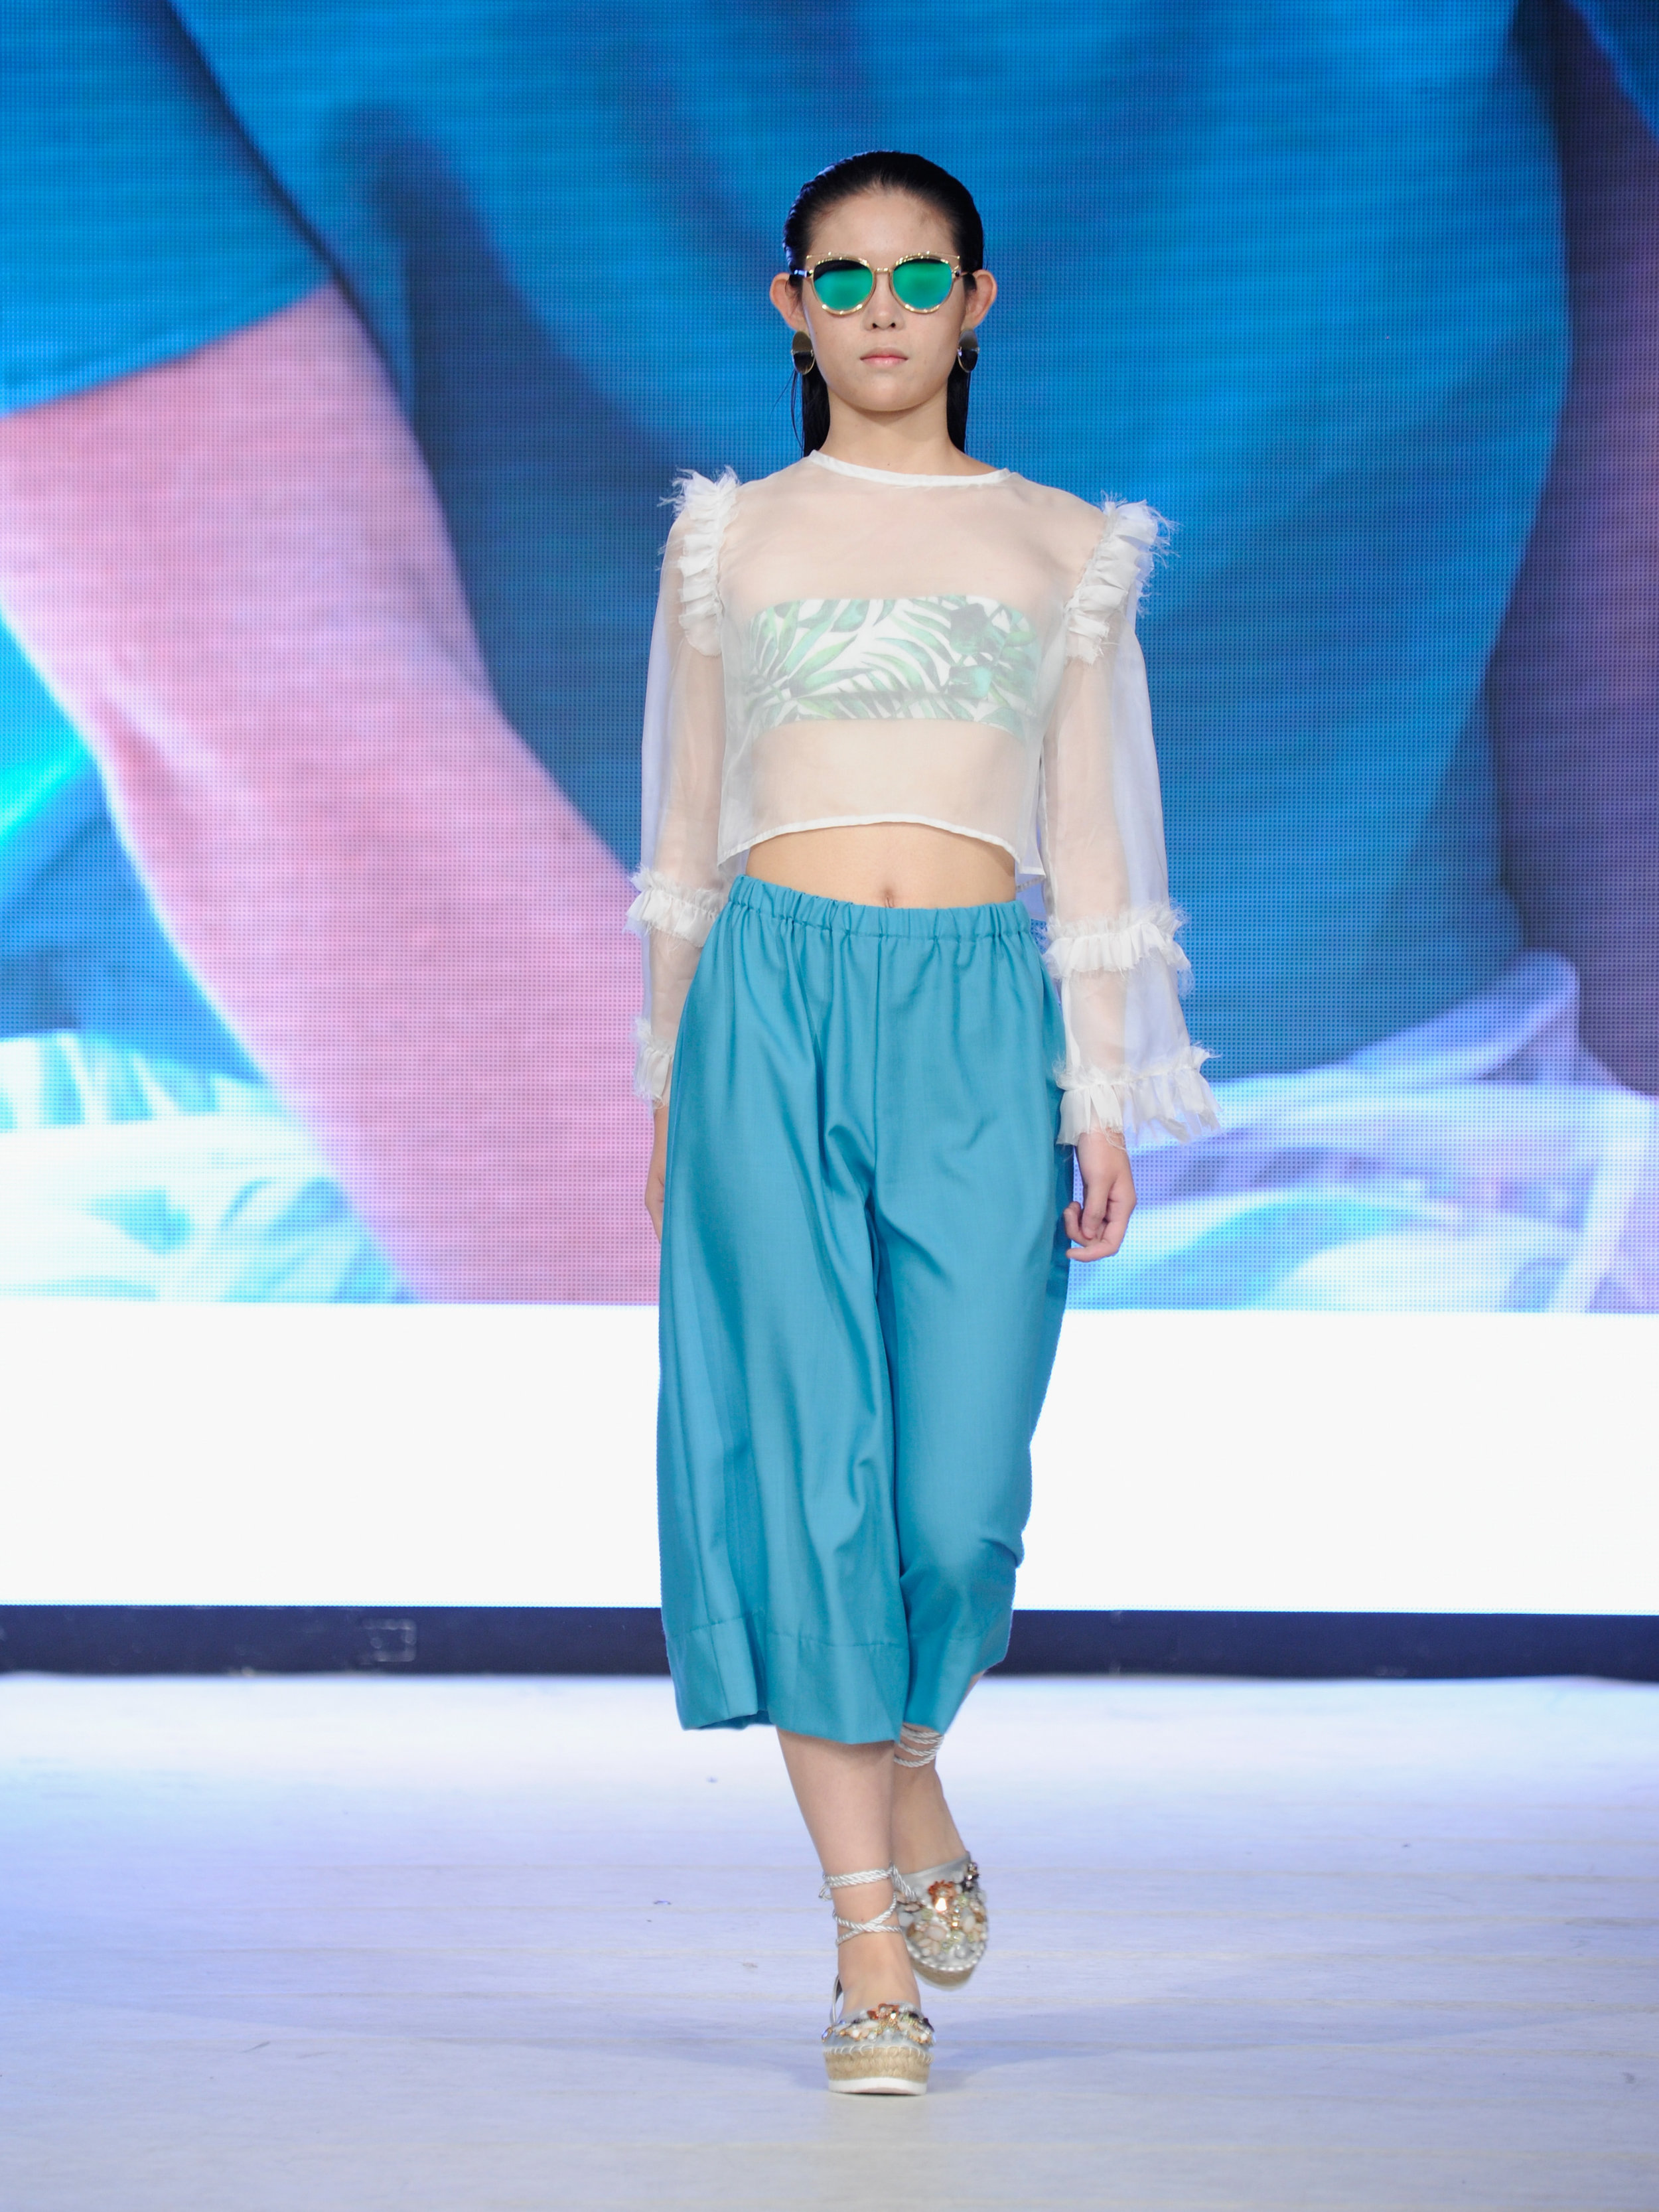 look 7 - 100% linen bandeau top100% silk blouse100% merino wool culottes